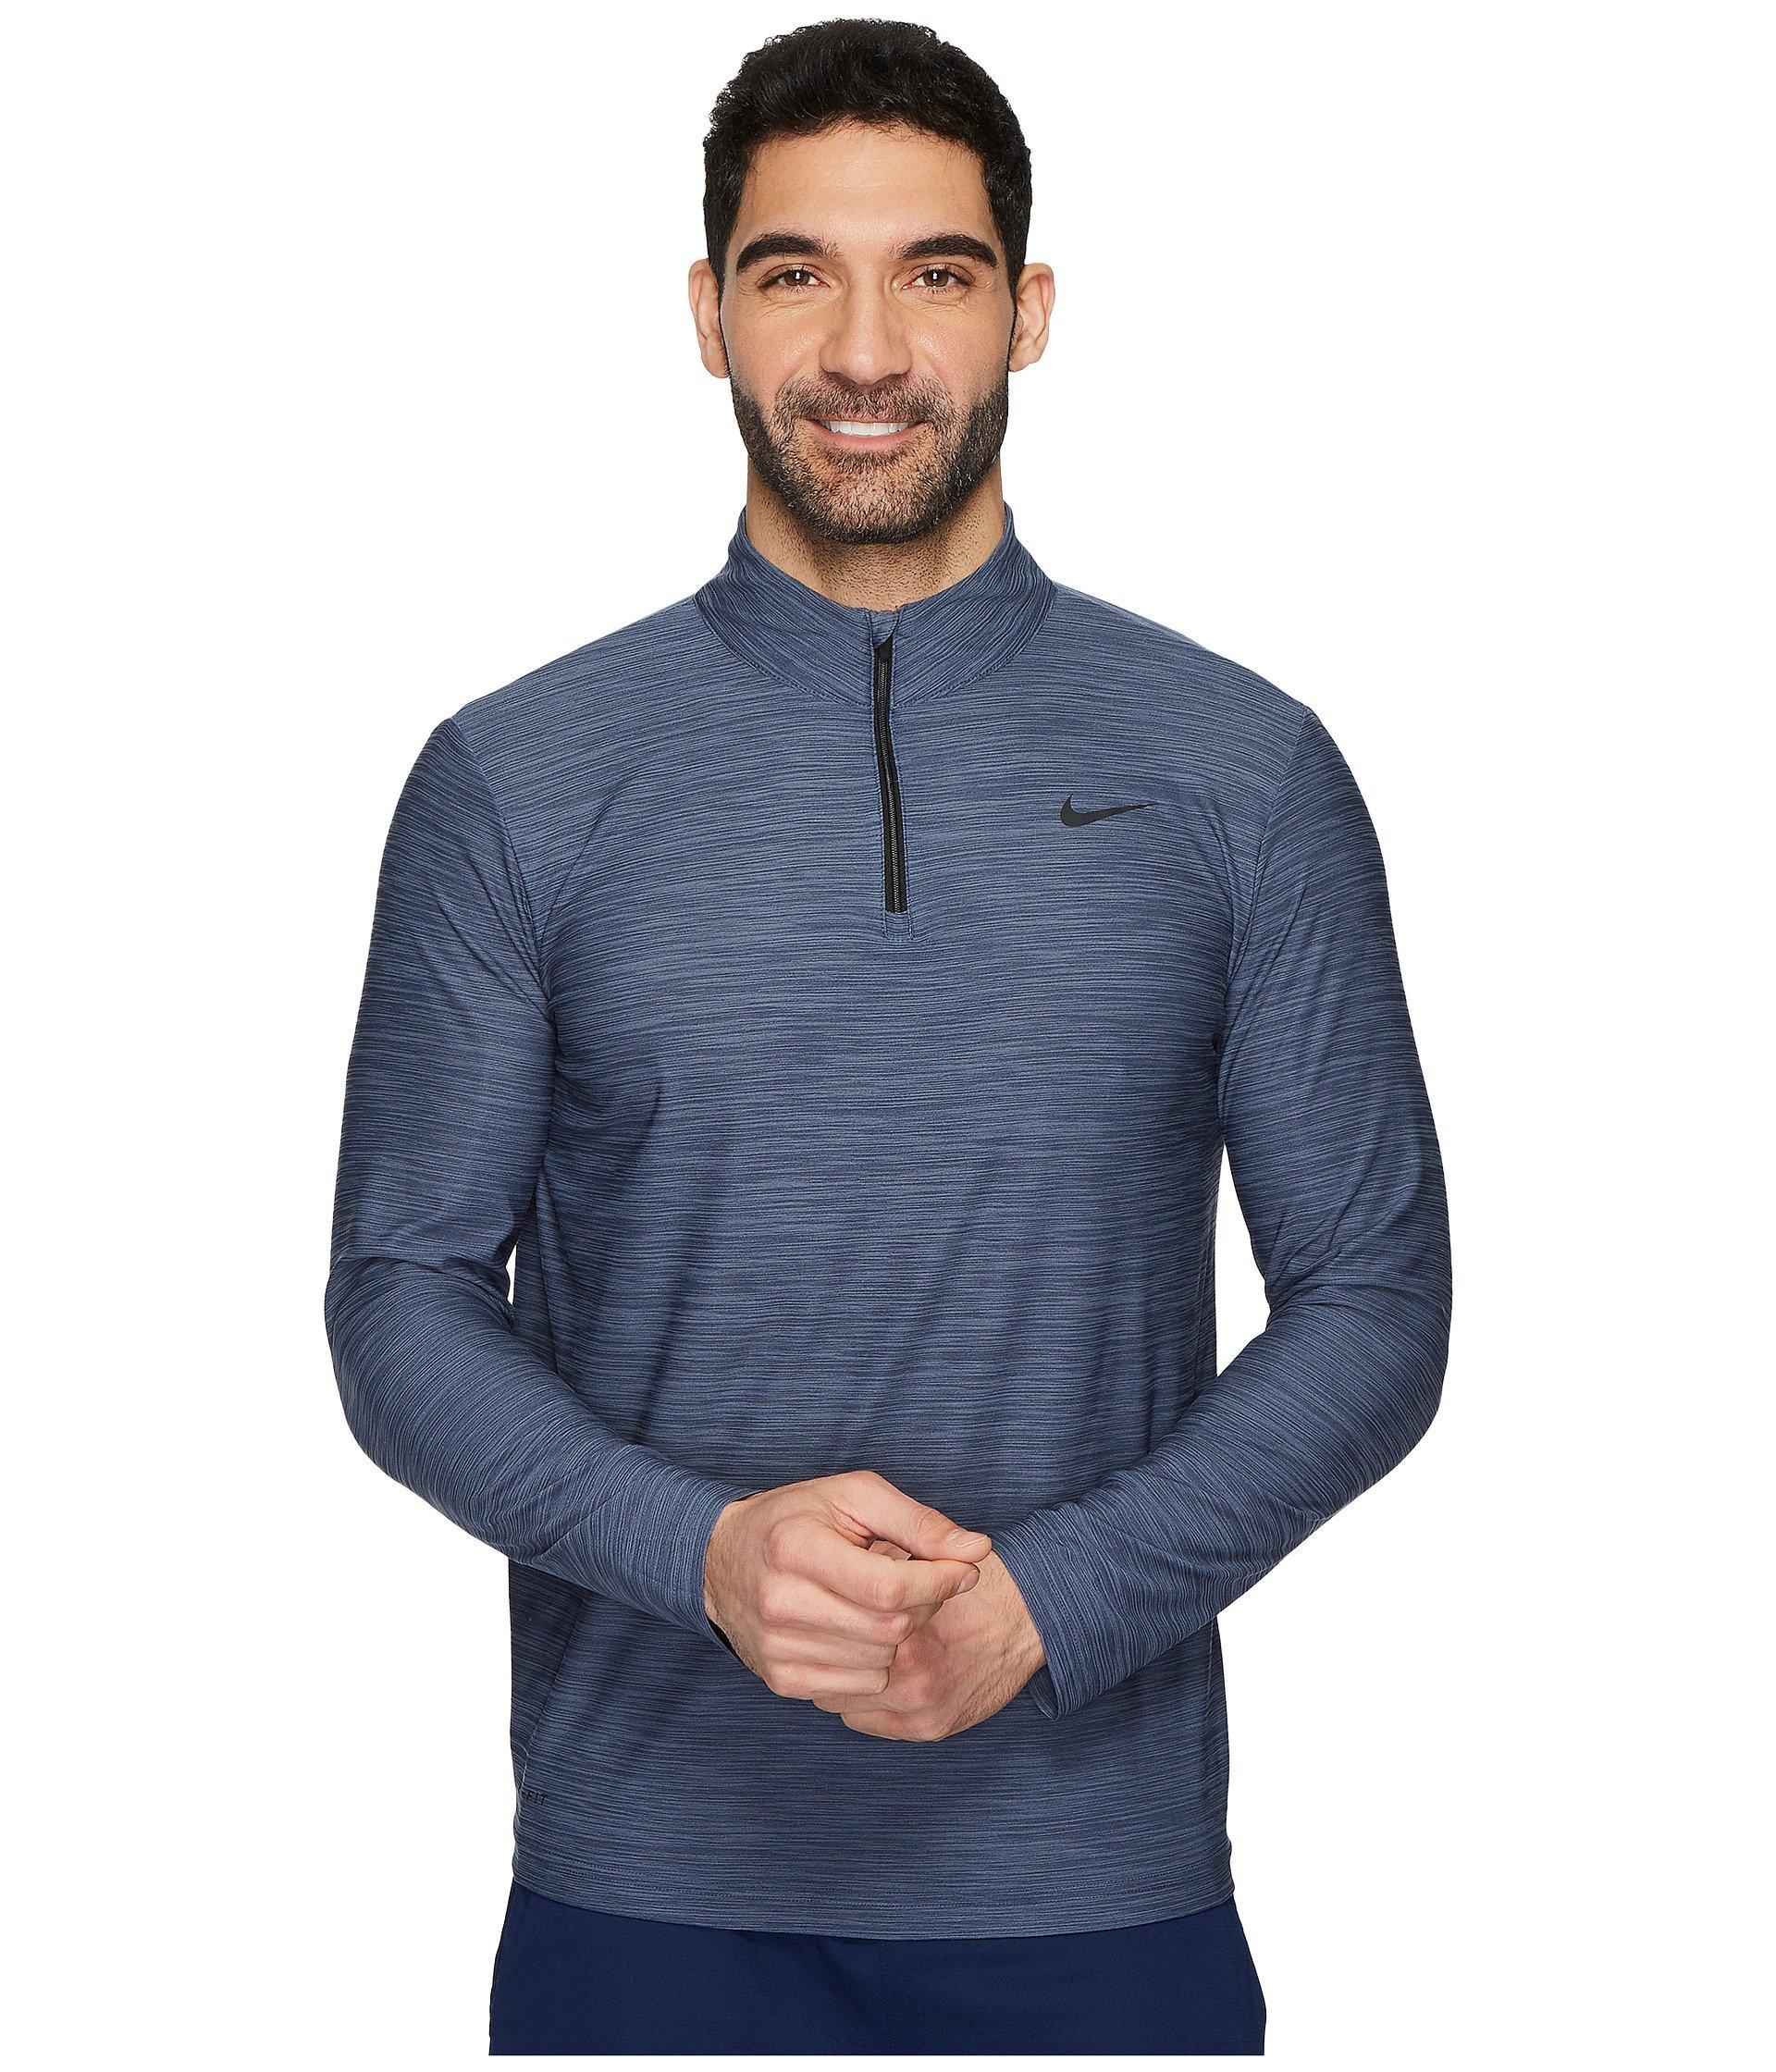 NIKE Mens Breathe Dri-Fit 1/4 Zip Long Sleeve Training Shirt 940177 (XX-Large, Light Carbon/Thunder Blue-Black) by Nike